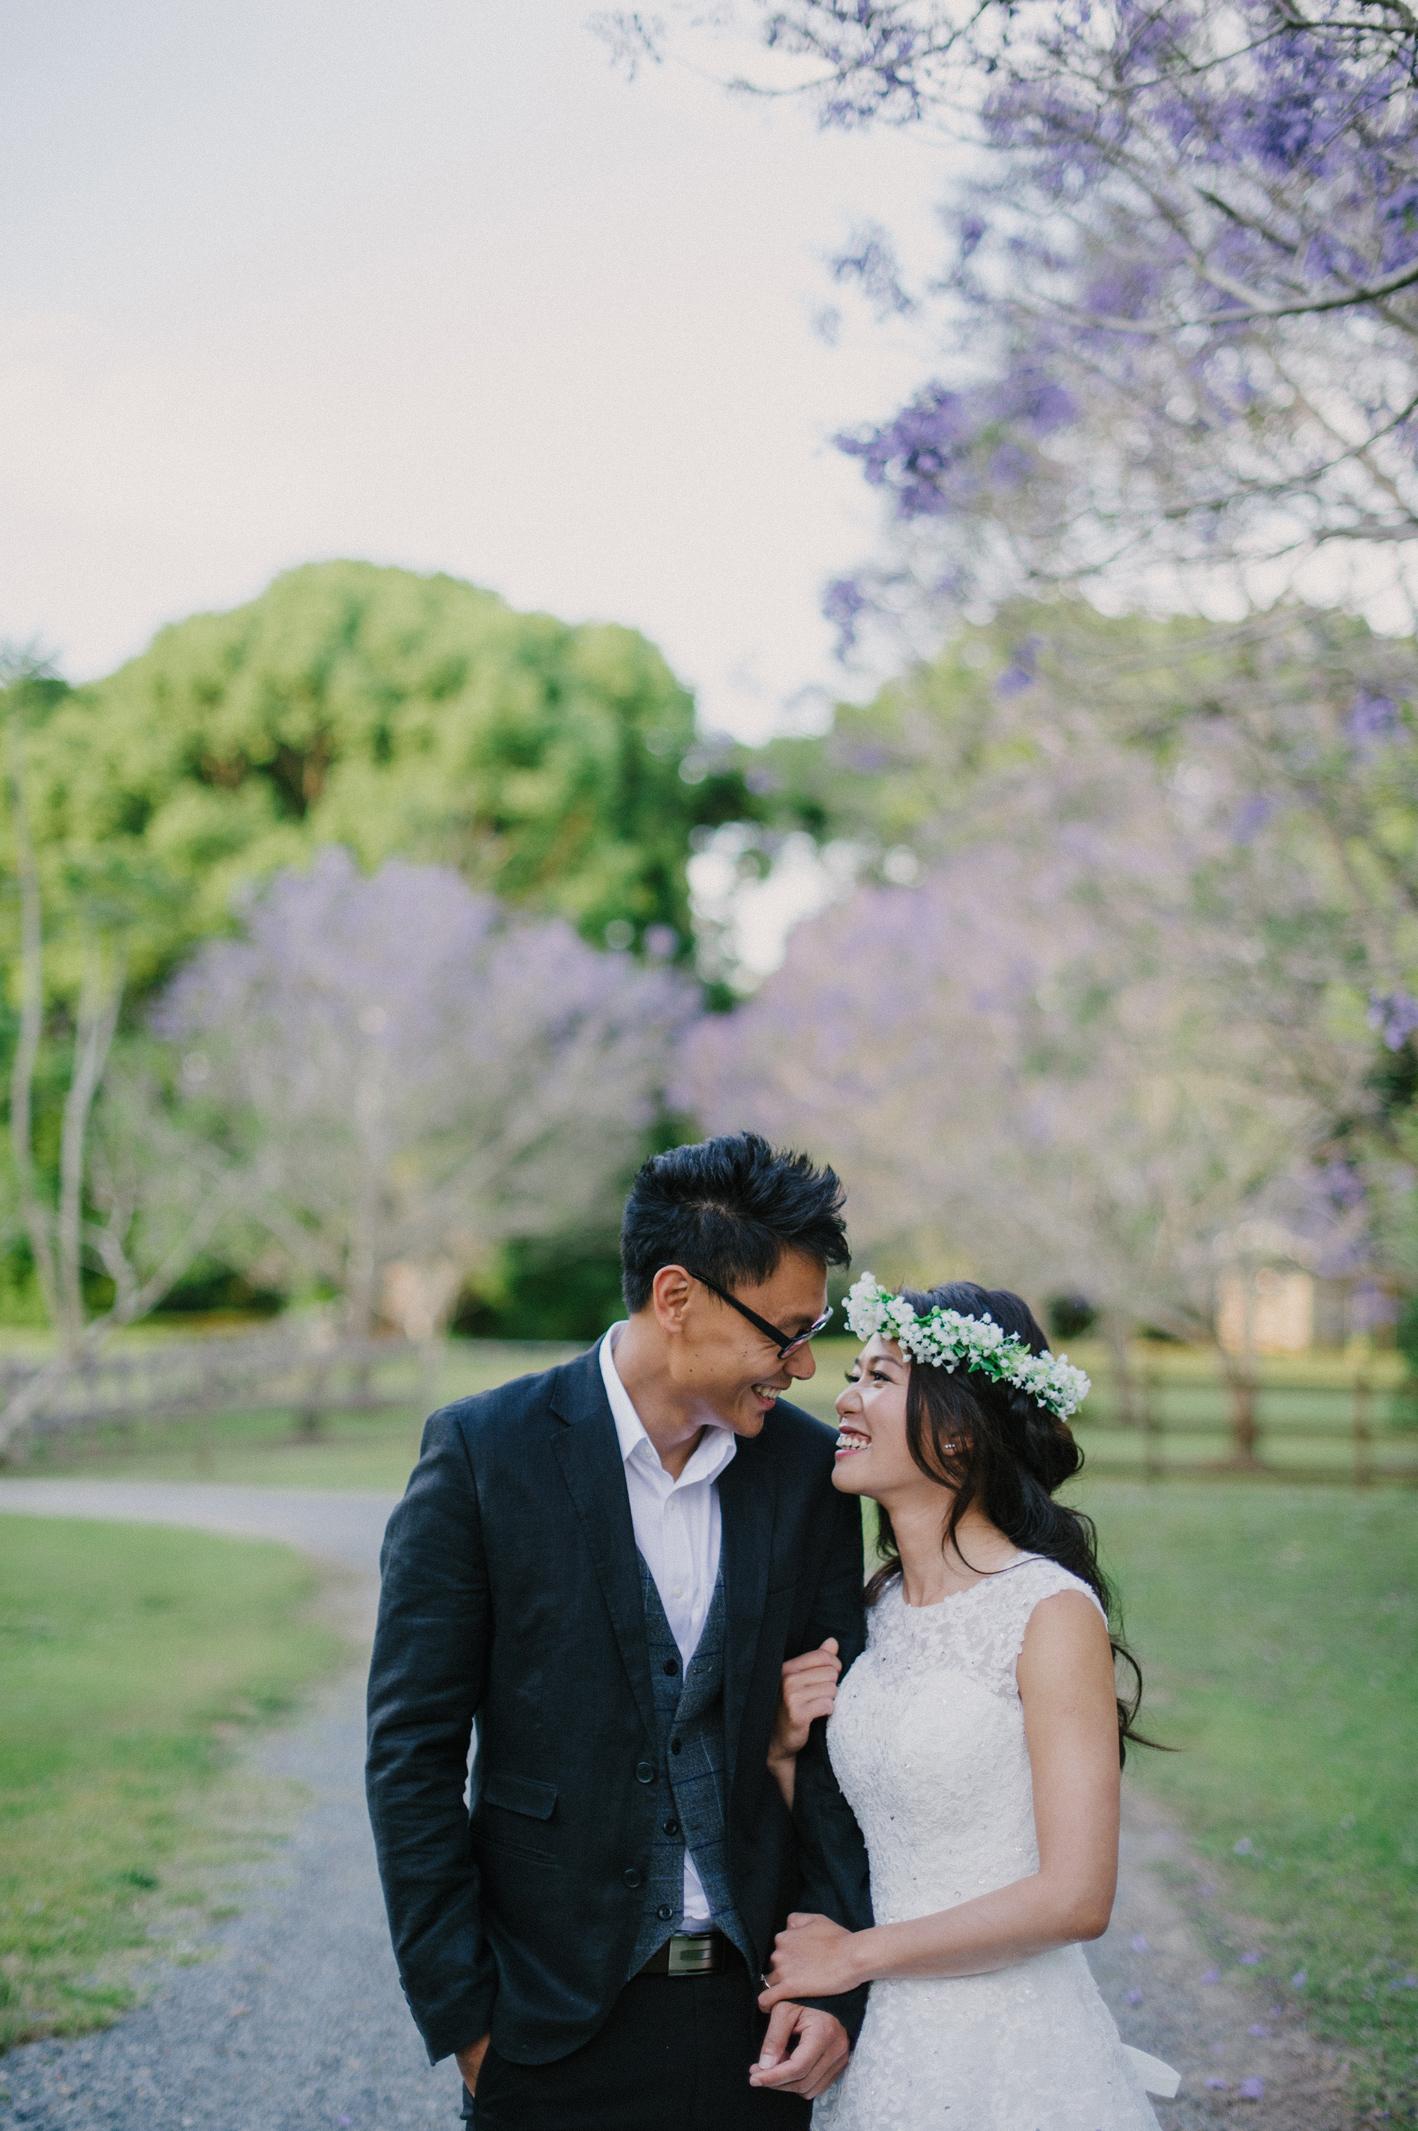 003-ed-janet-currumbin-wedding_sophie-baker-photography